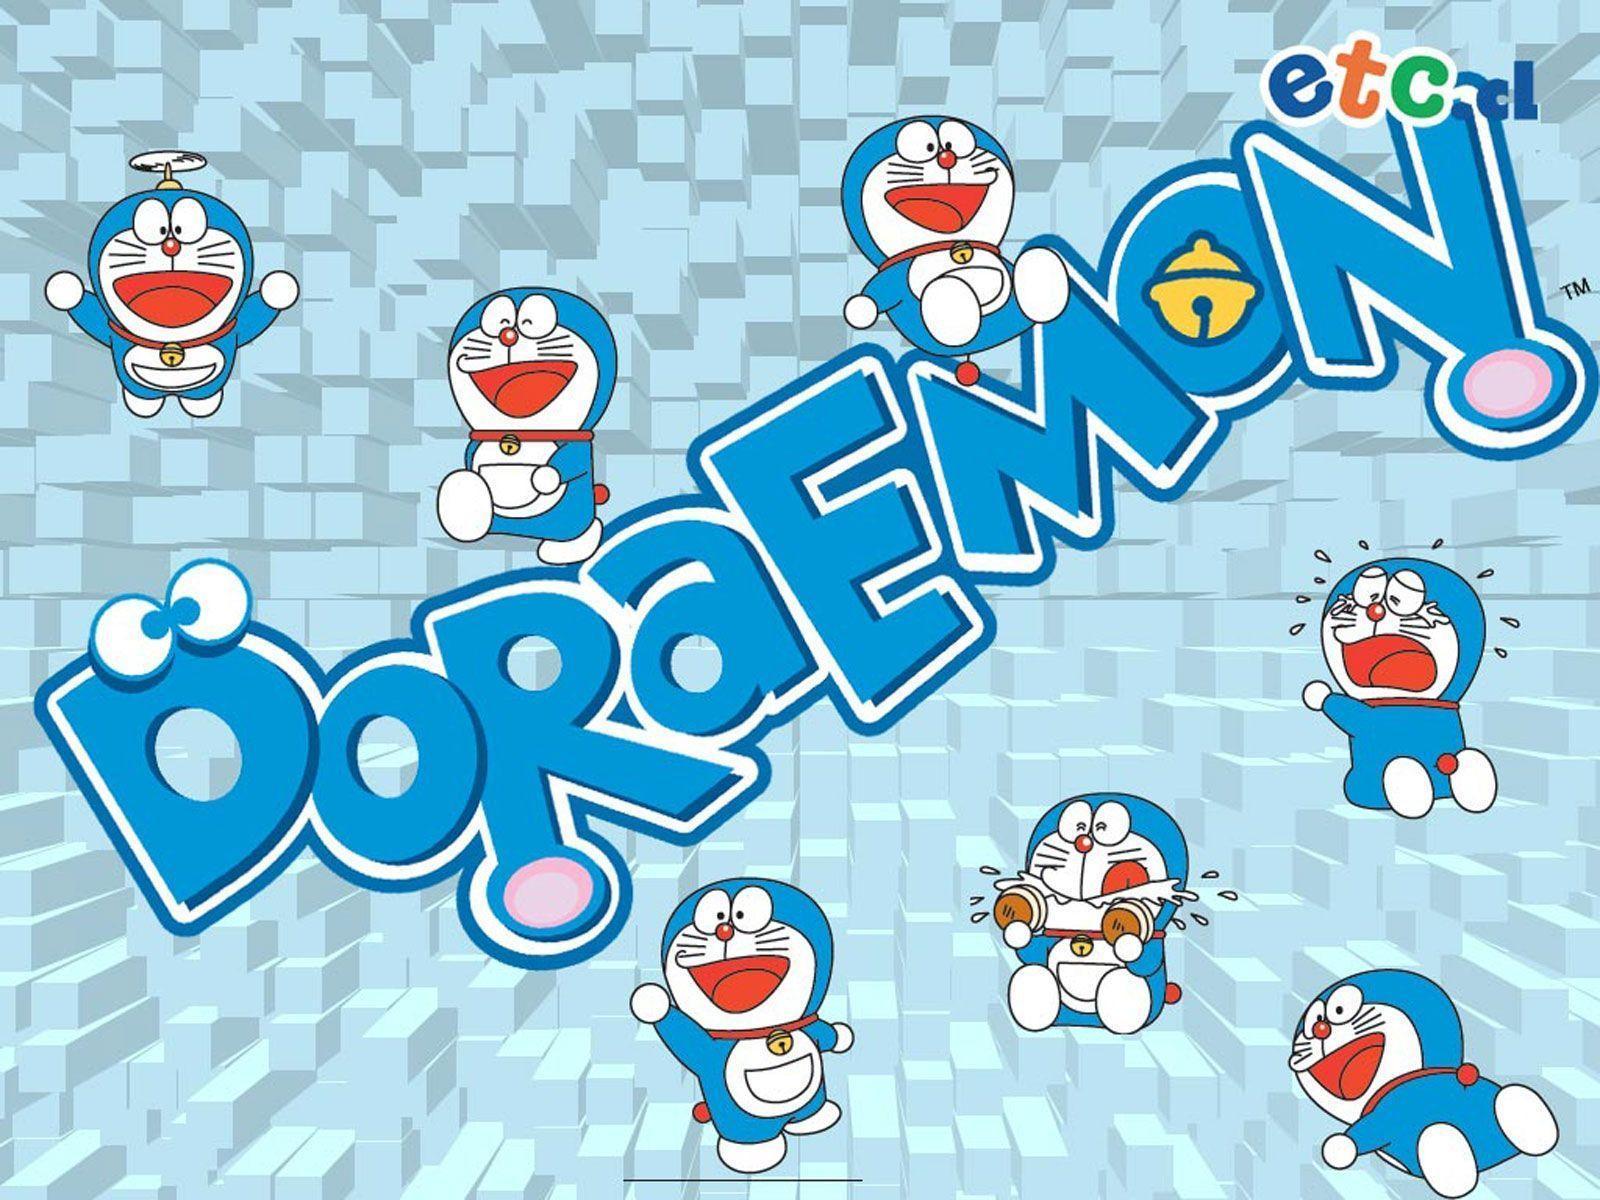 doraemon wallpaper for ipad - Free Download Wallpaper Desktop ...